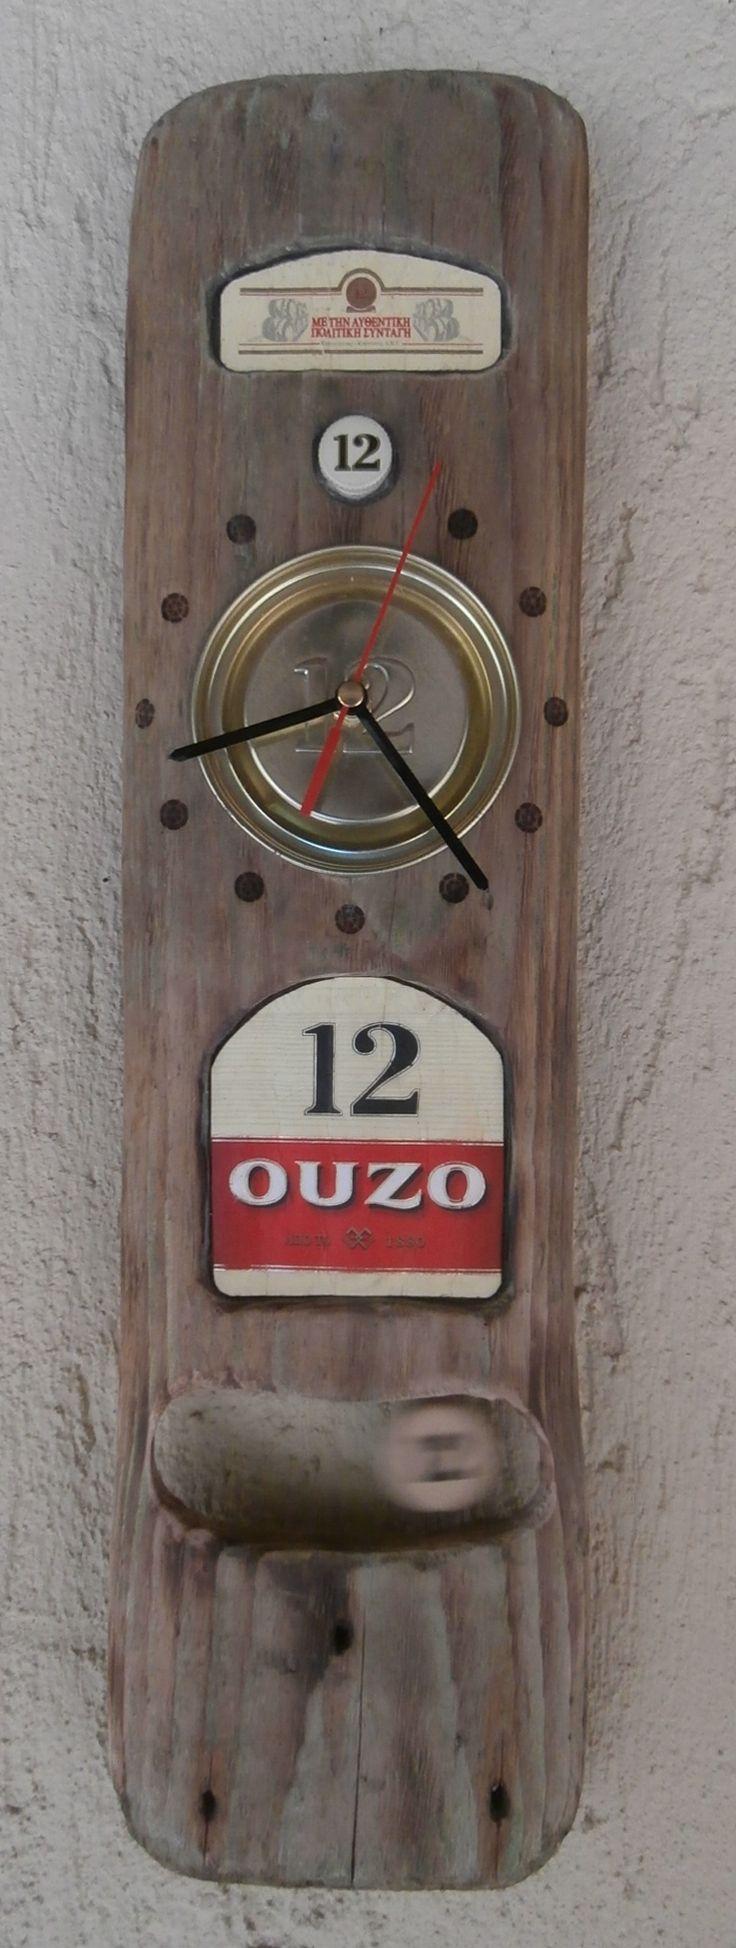 Driftwood 'Ouzo 12' Brand Clock